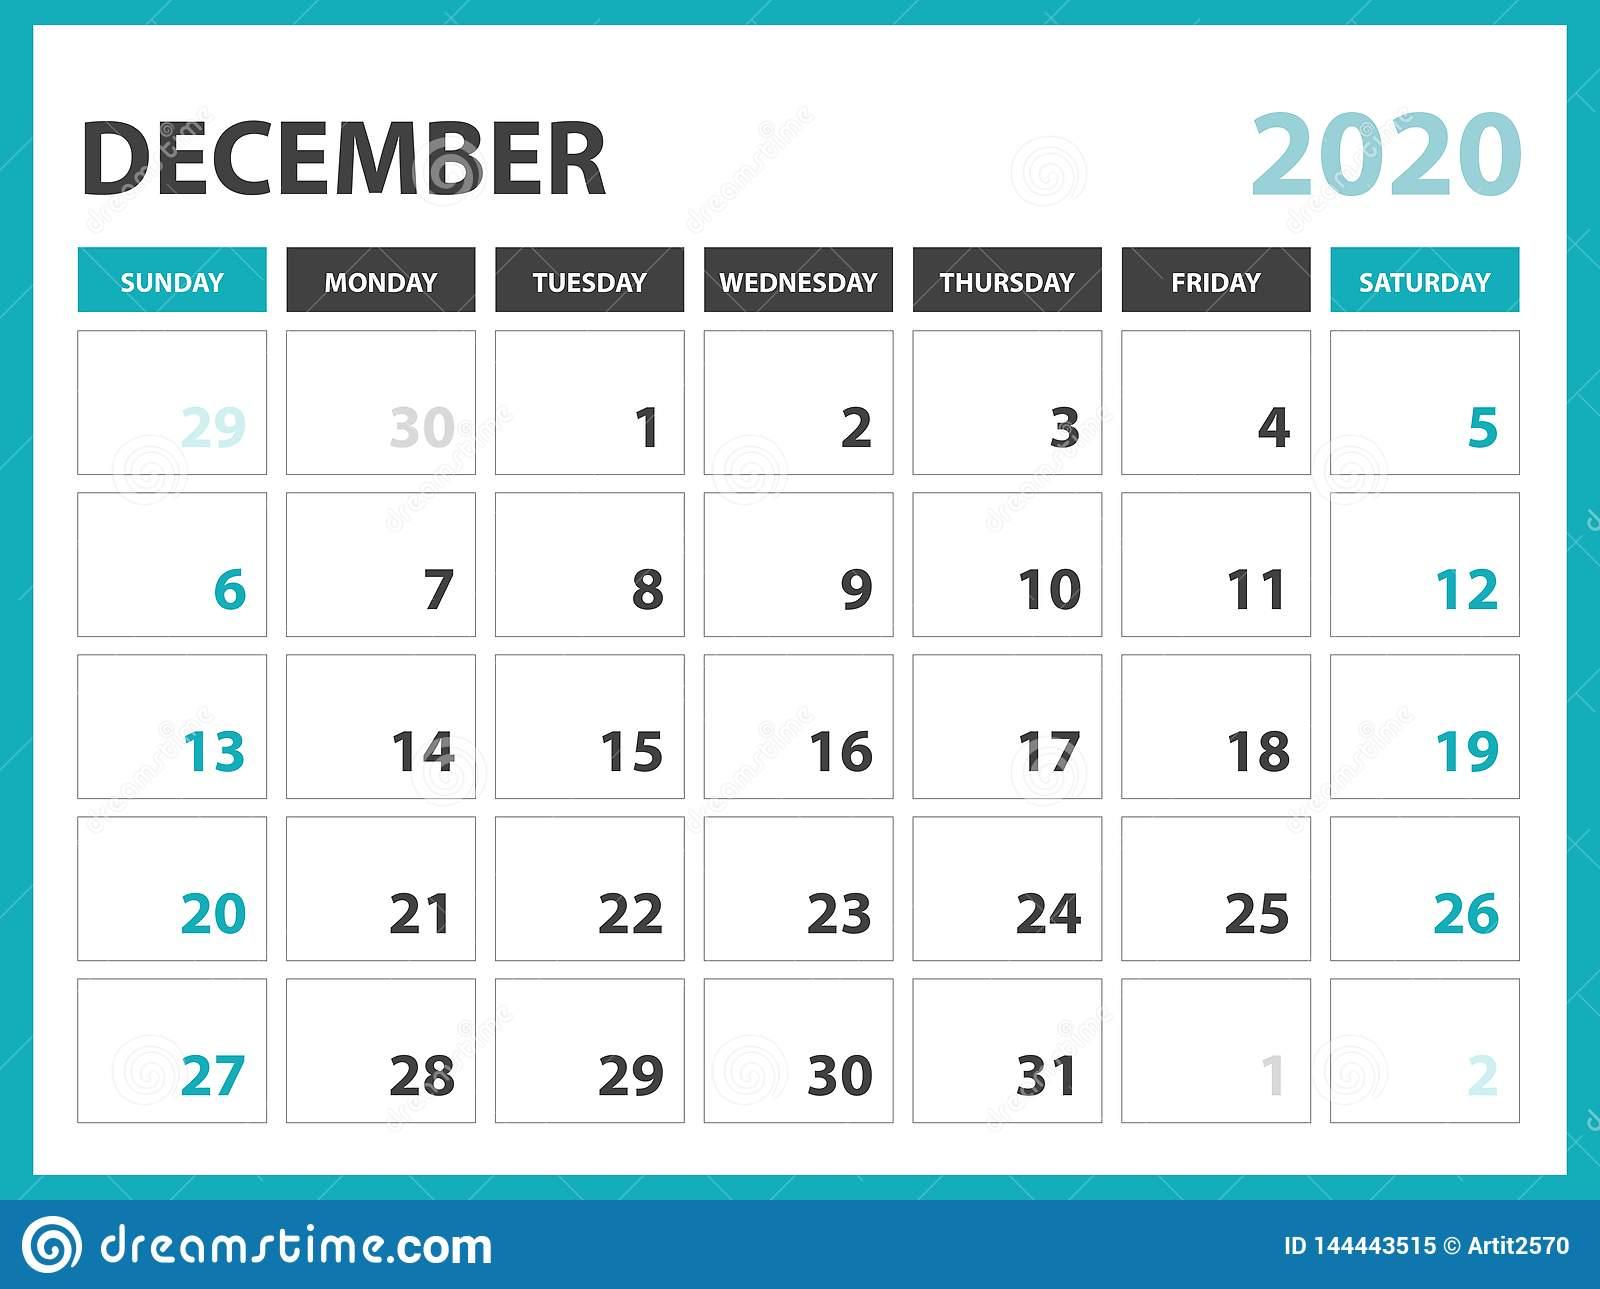 Desk Calendar Layout Size 8 X 6 Inch, December 2020 Calendar within Blank Calendar 6 Weeks Start On Sunday